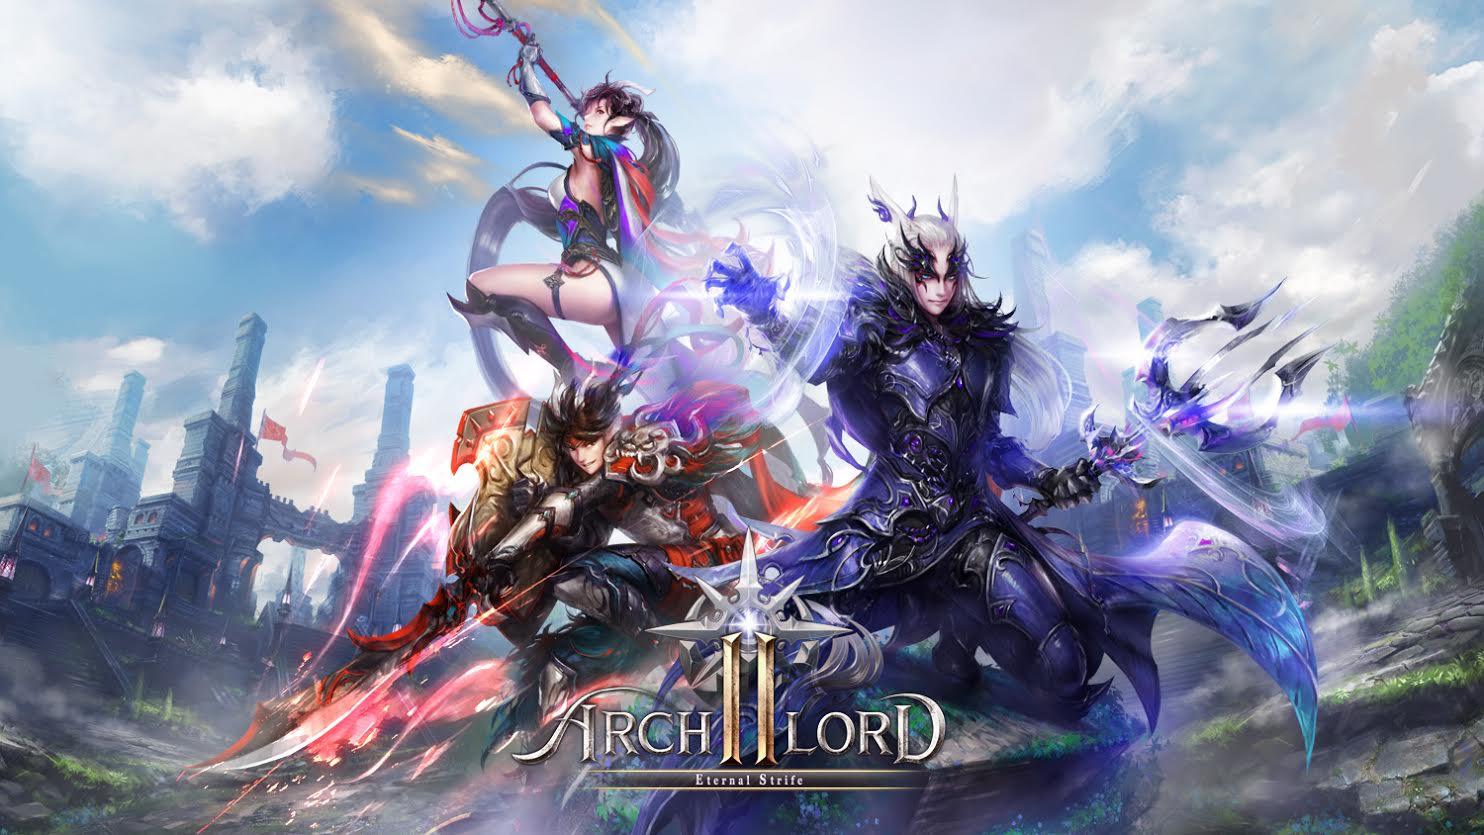 Archlord 2 Guild Battle key art